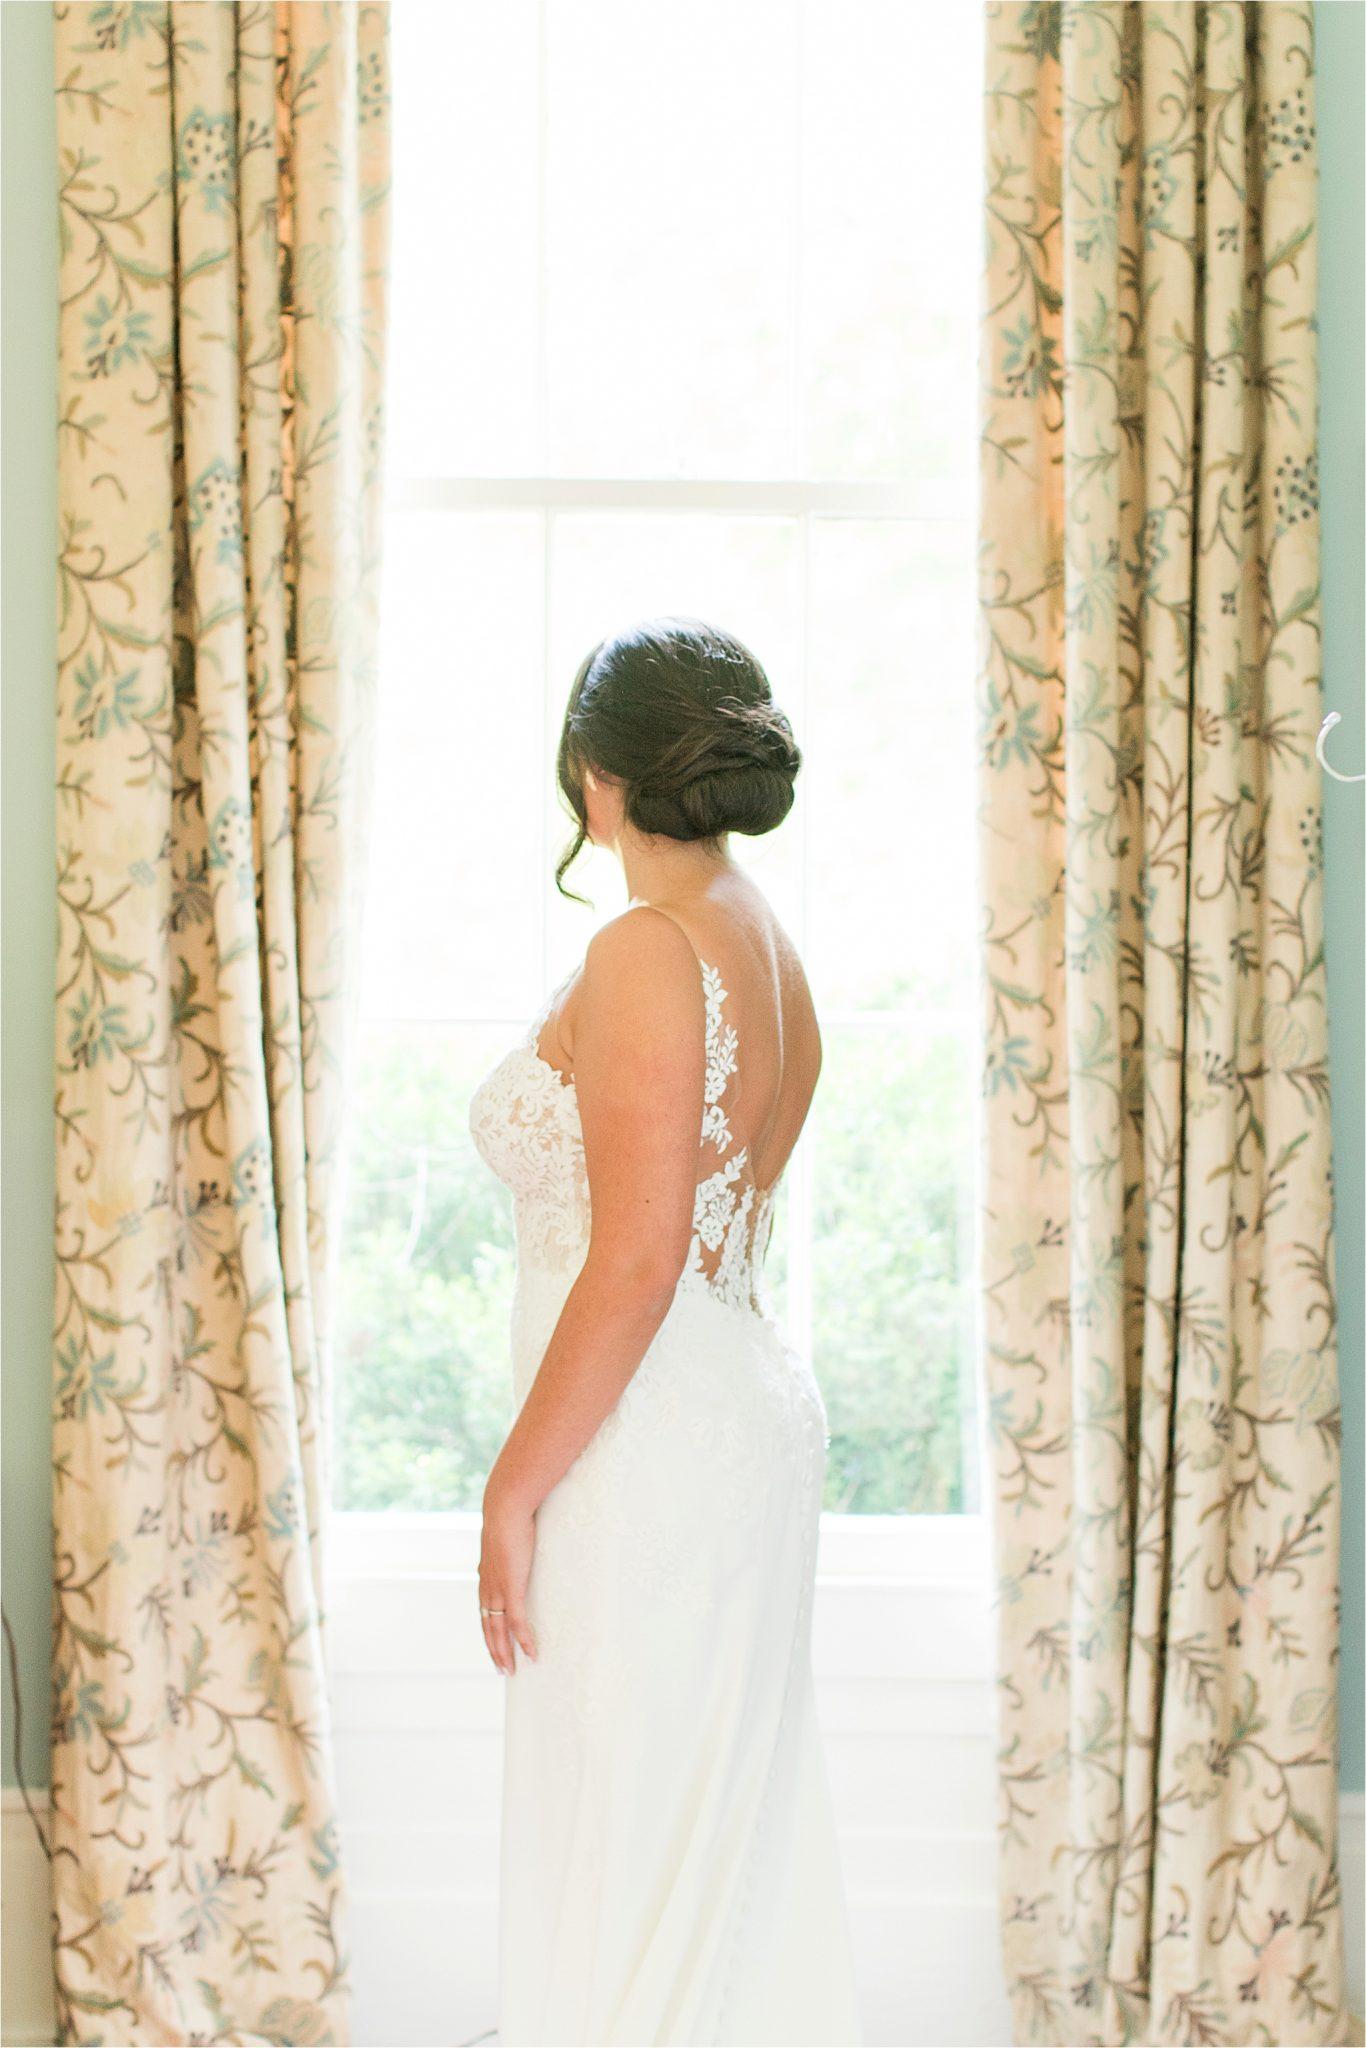 Hedge Farm Wedding , Alabama Wedding Photographer, Barn Wedding, Wedding Dress